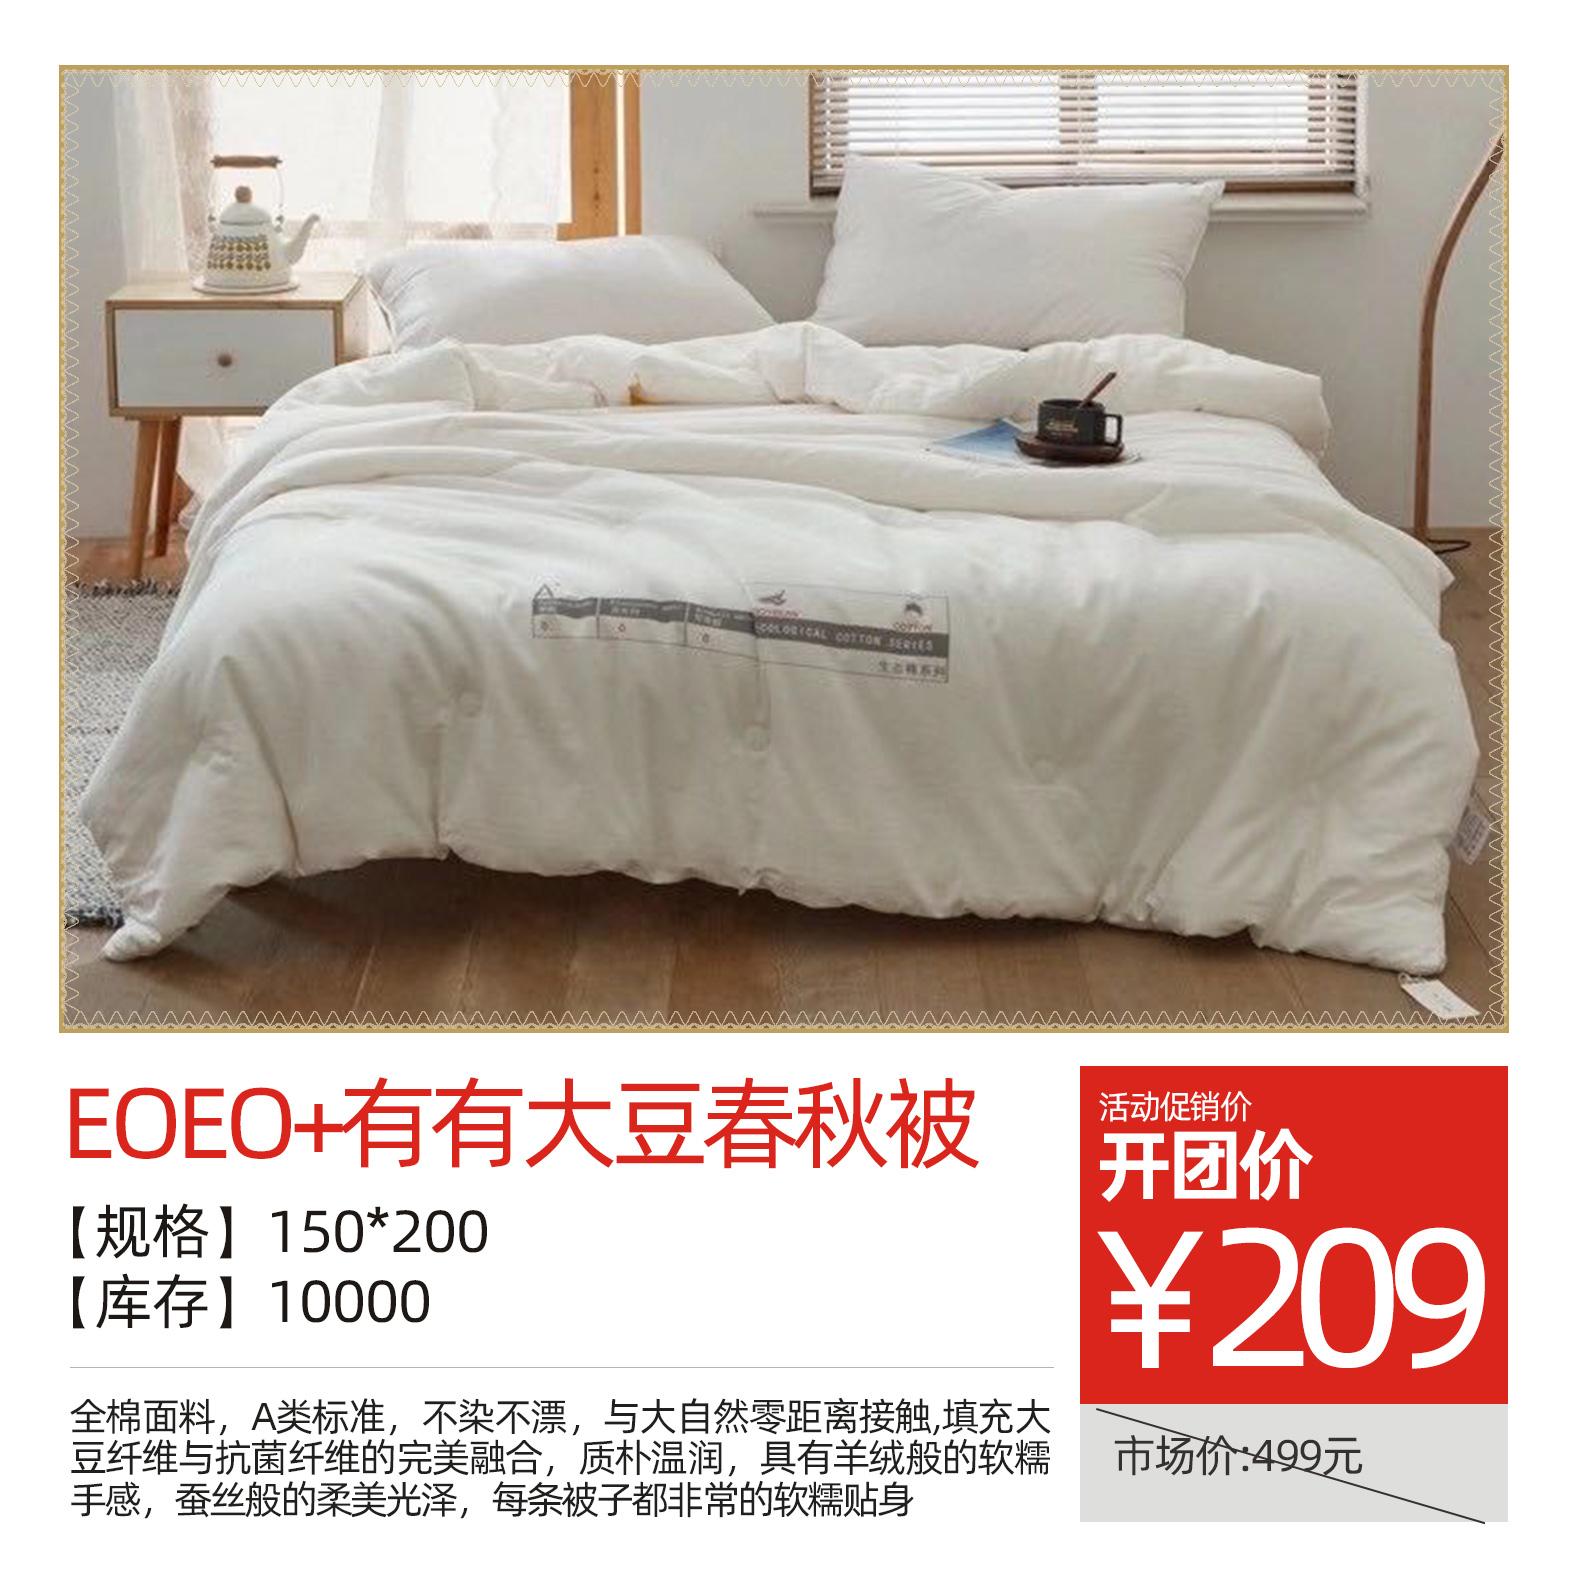 eoeo+有有大豆春秋被150*200